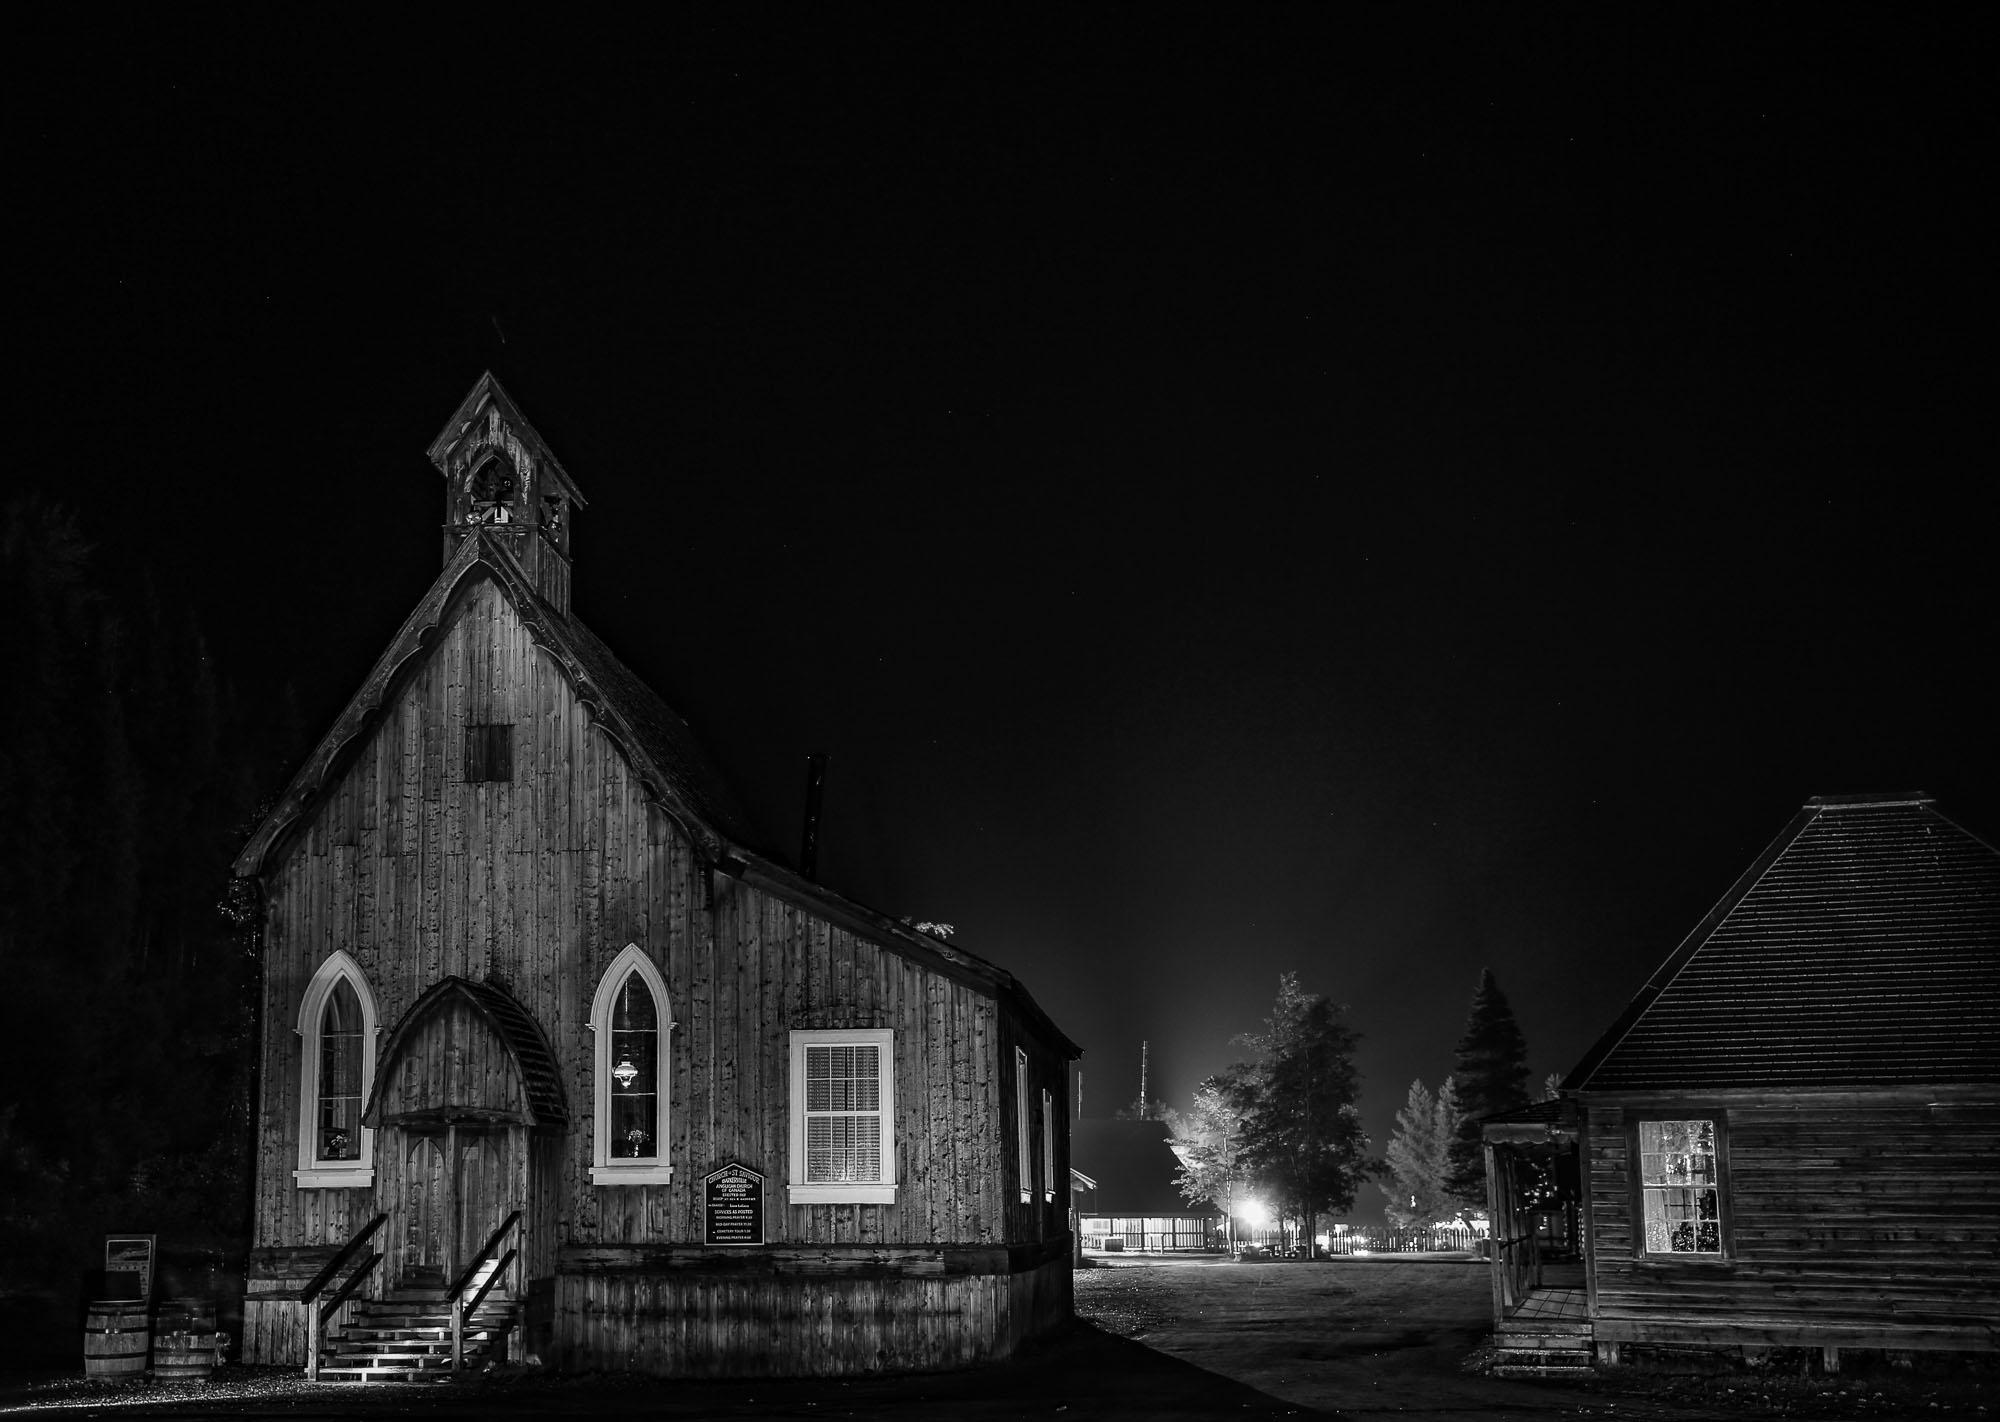 Historic Barkerville church on the Main street at night.